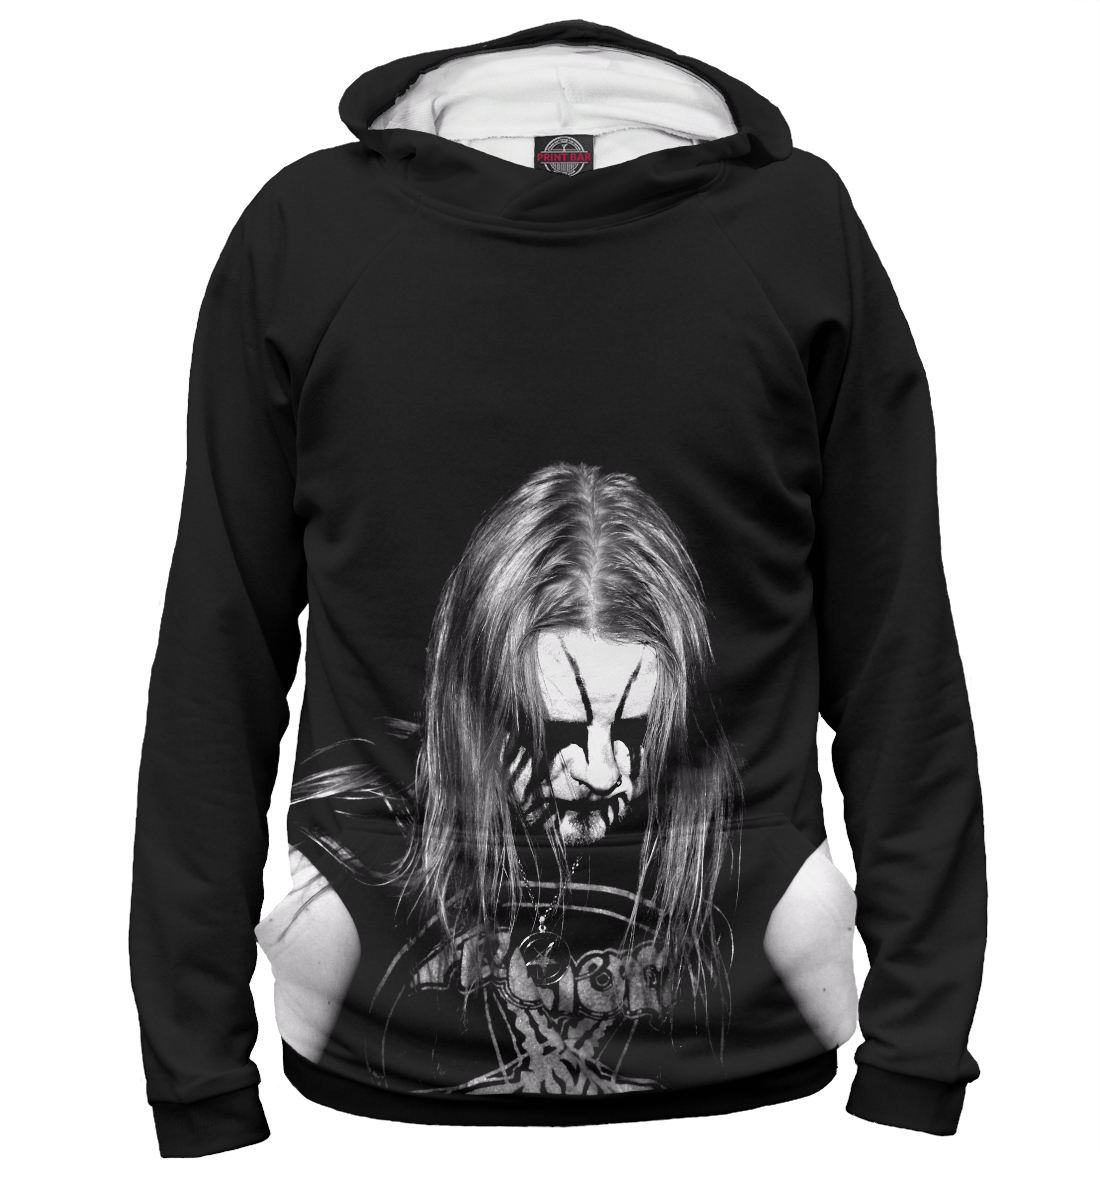 Купить Black Metal Ist Krieg, Printbar, Худи, MZK-322984-hud-1